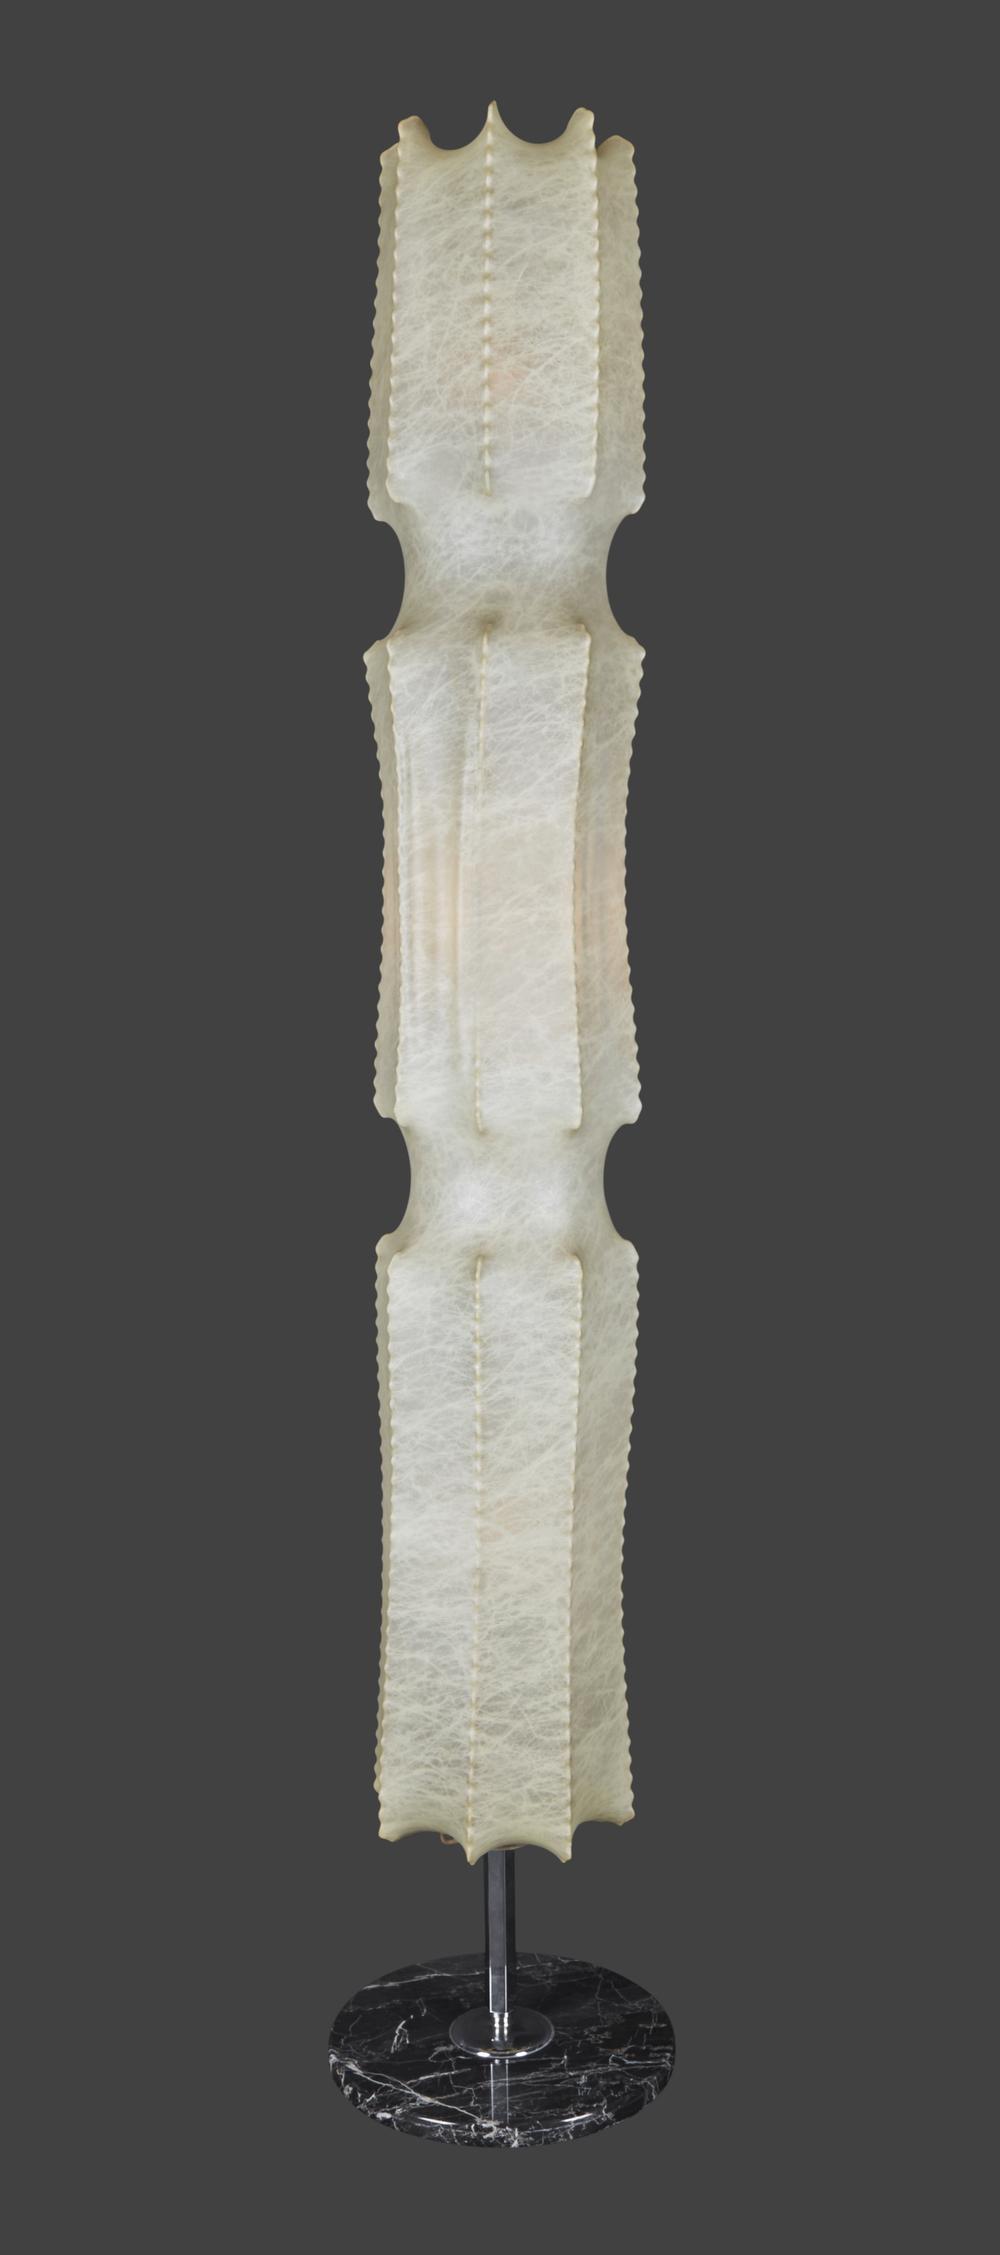 "ITALIAN GOATSKIN LAMP 61"" h. x 6"" w. $4,800"